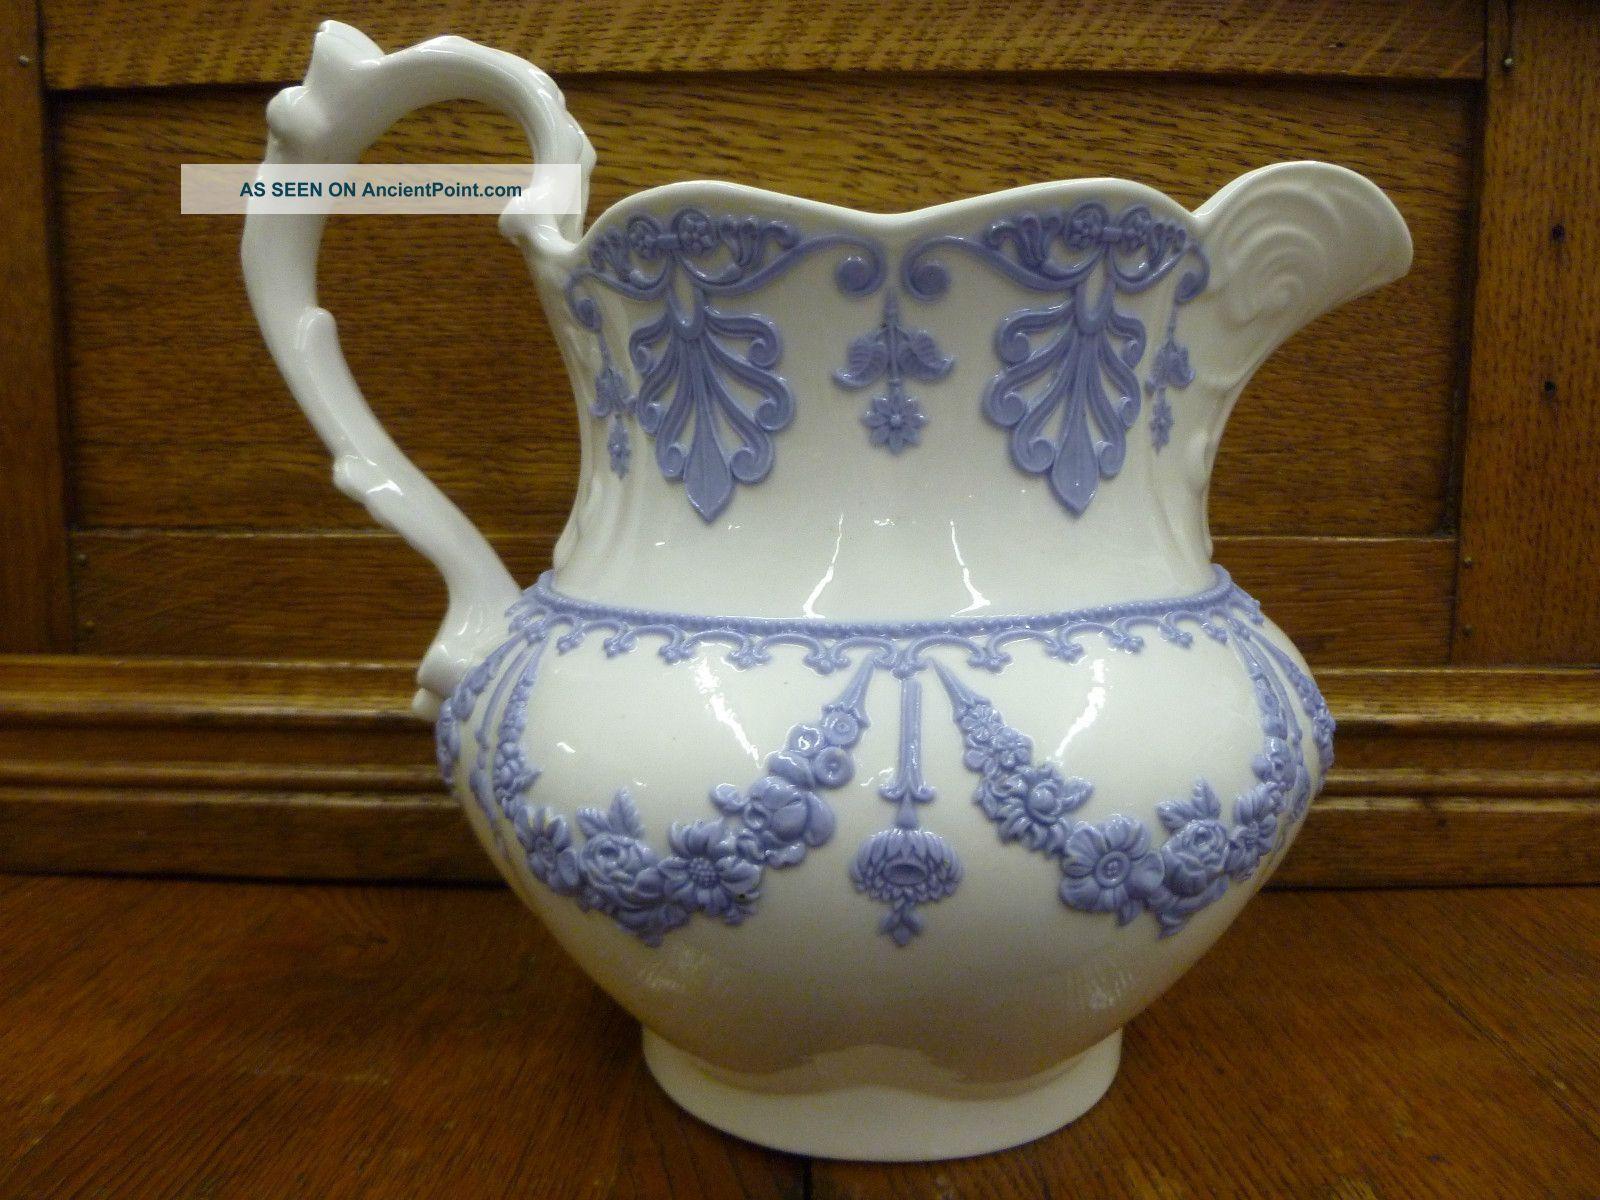 ceramic milk jug vase of antique milk or water pitchers antique blue white 1800 s water intended for antique milk or water pitchers antique blue white 1800 s water milk pitcher wedgwood ridgway